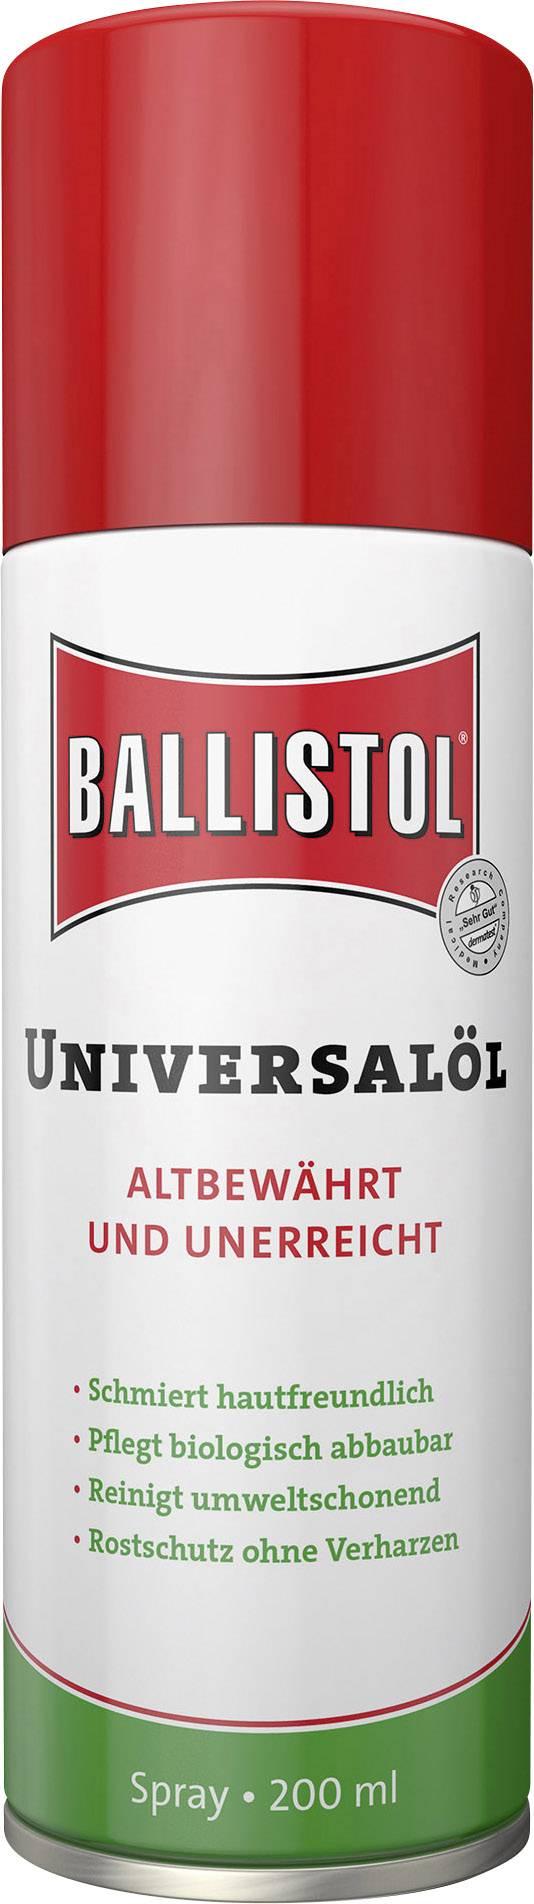 ZBROJNÍ OLEJ BALLISTOL 200 ml